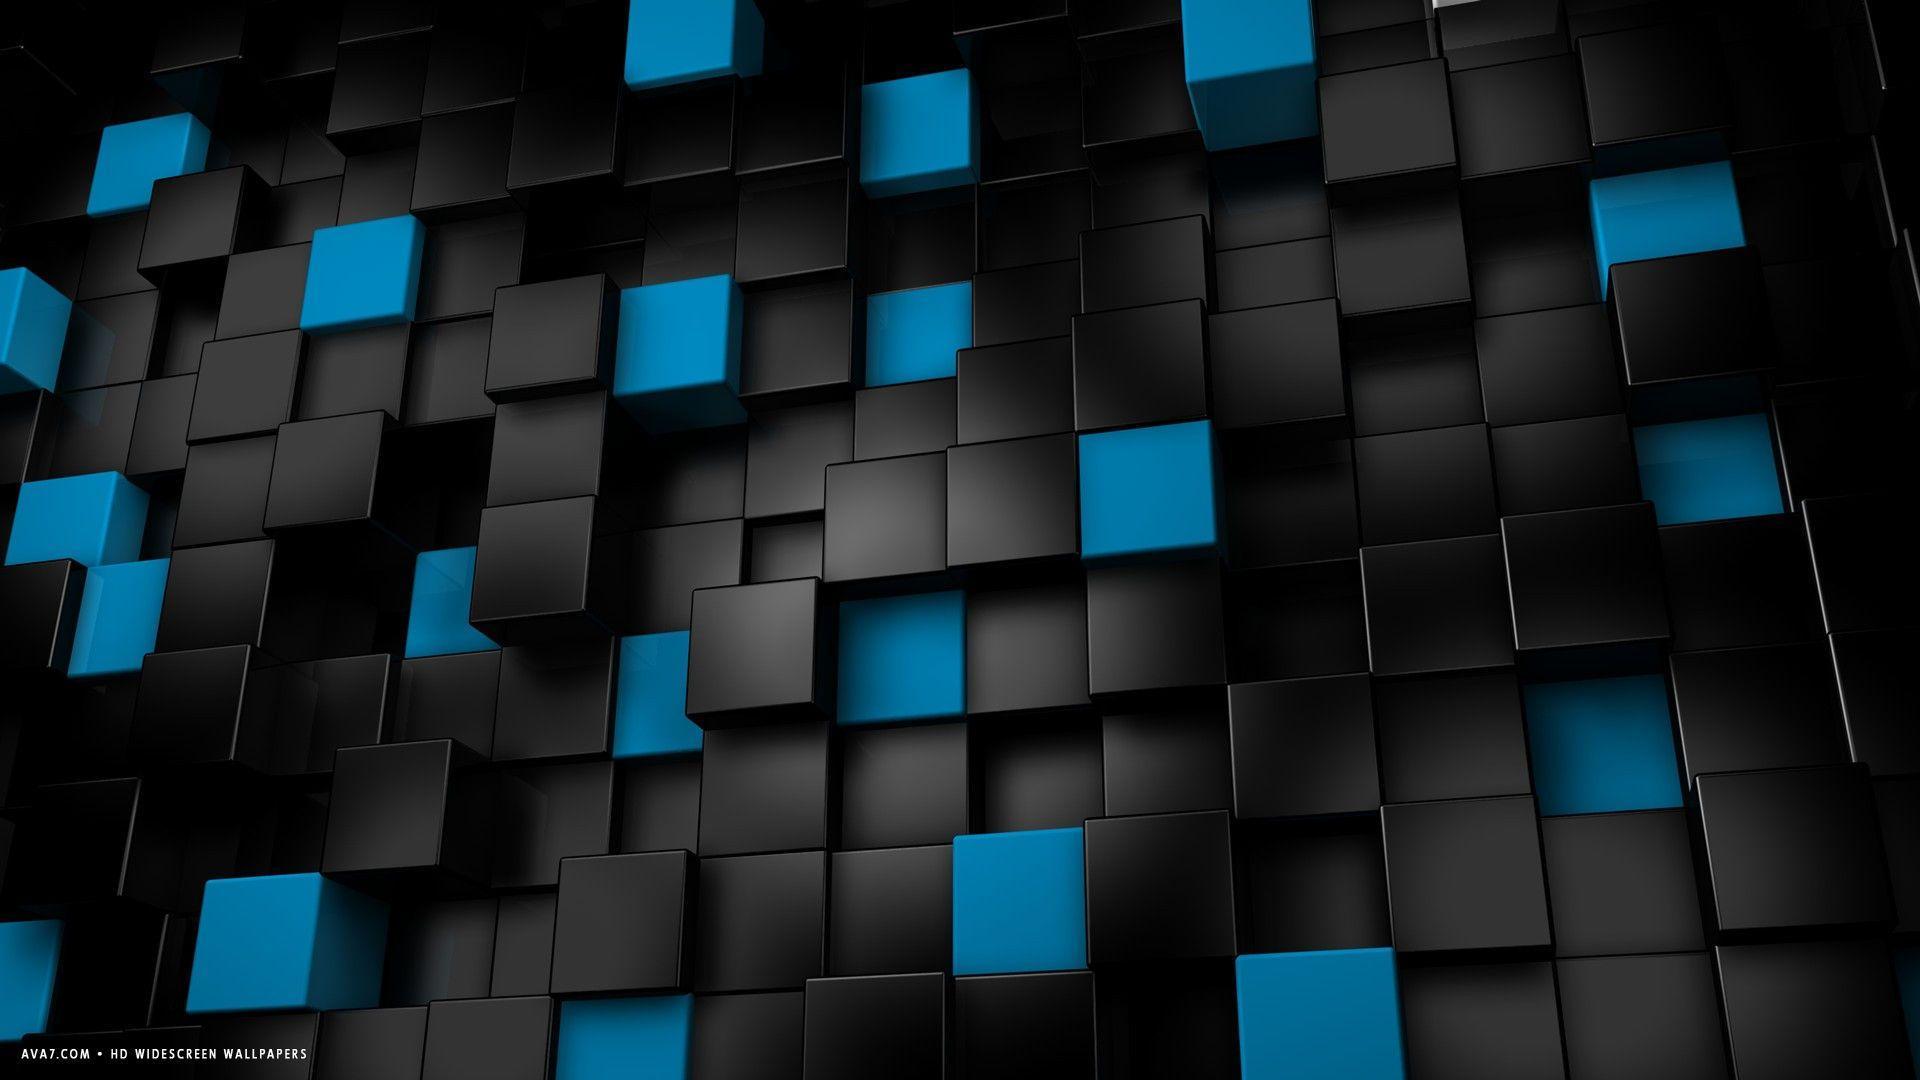 Hd wallpaper 1080p - Black 3d Hd Wallpapers 1080p Widescreen